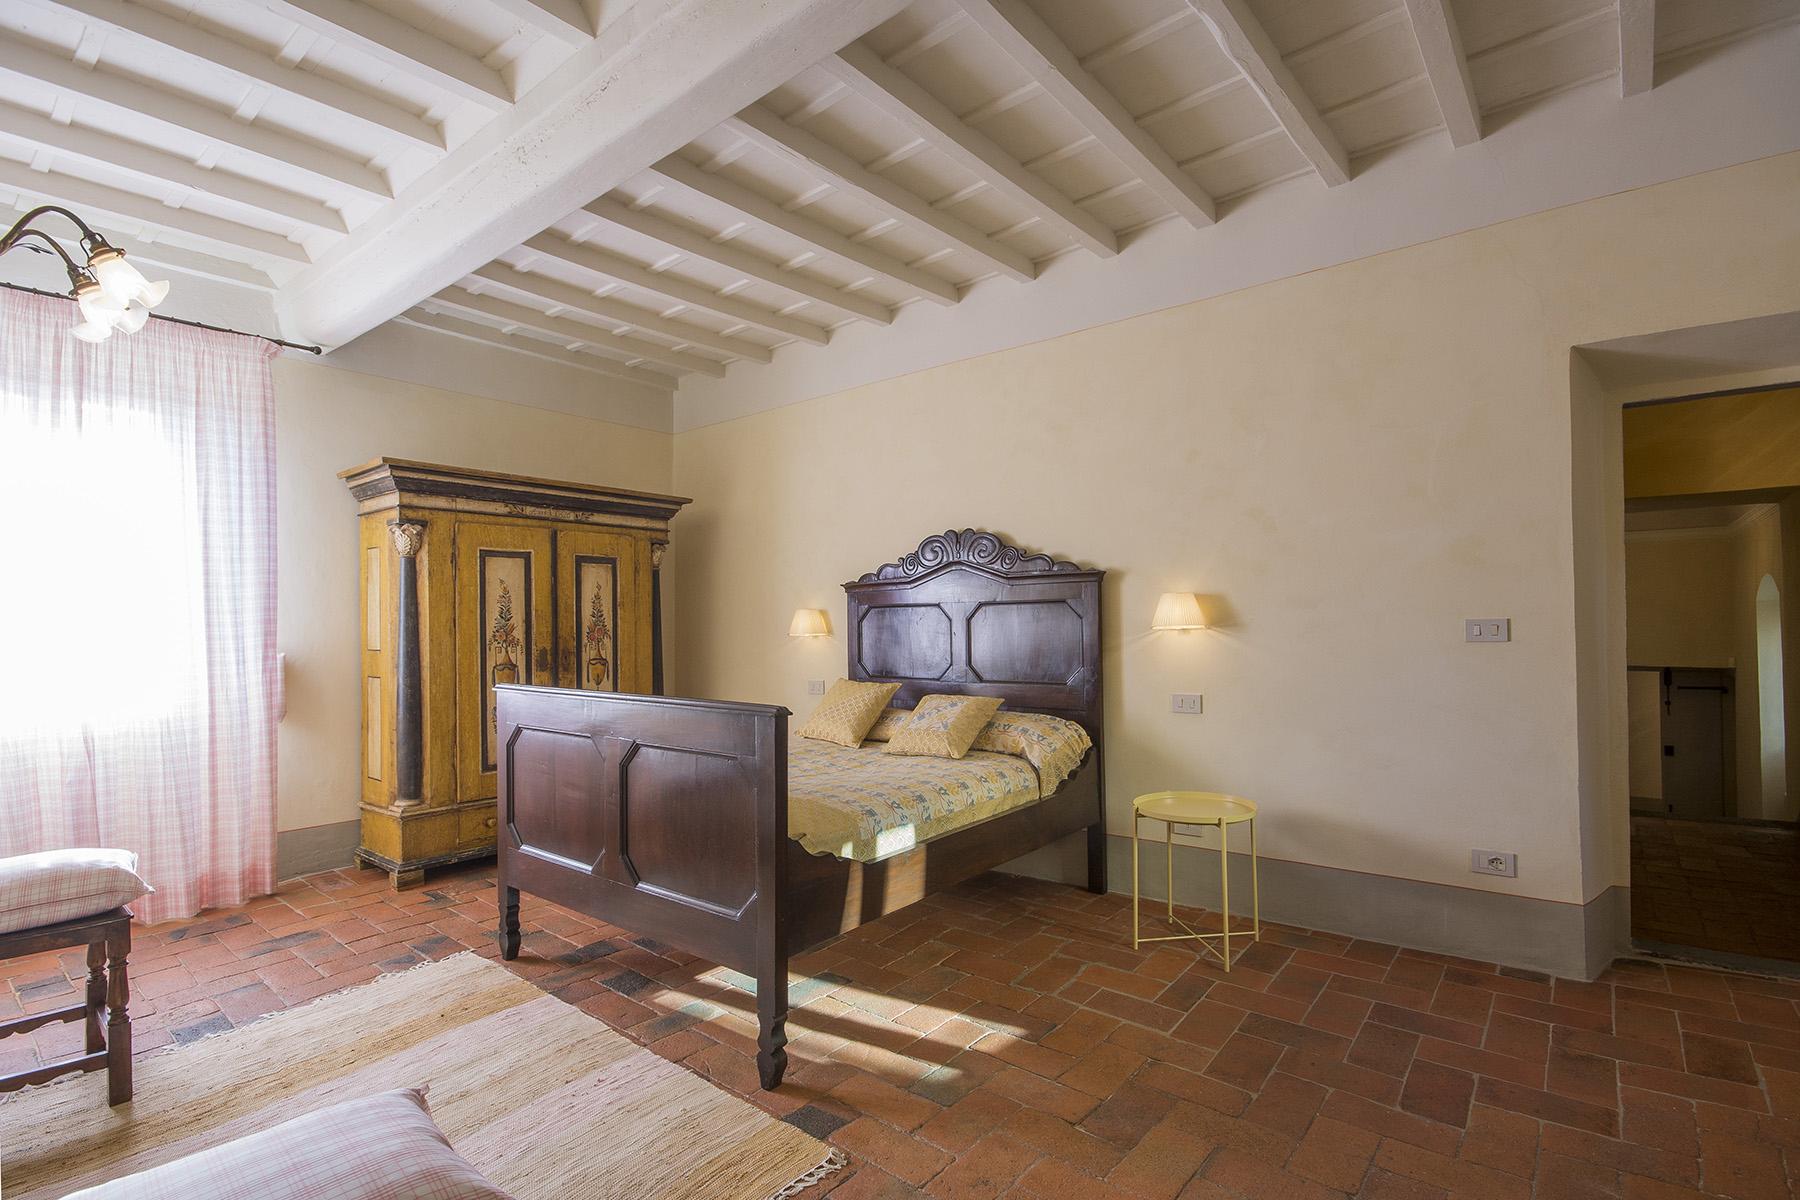 Villa in Affitto a Impruneta: 5 locali, 560 mq - Foto 9